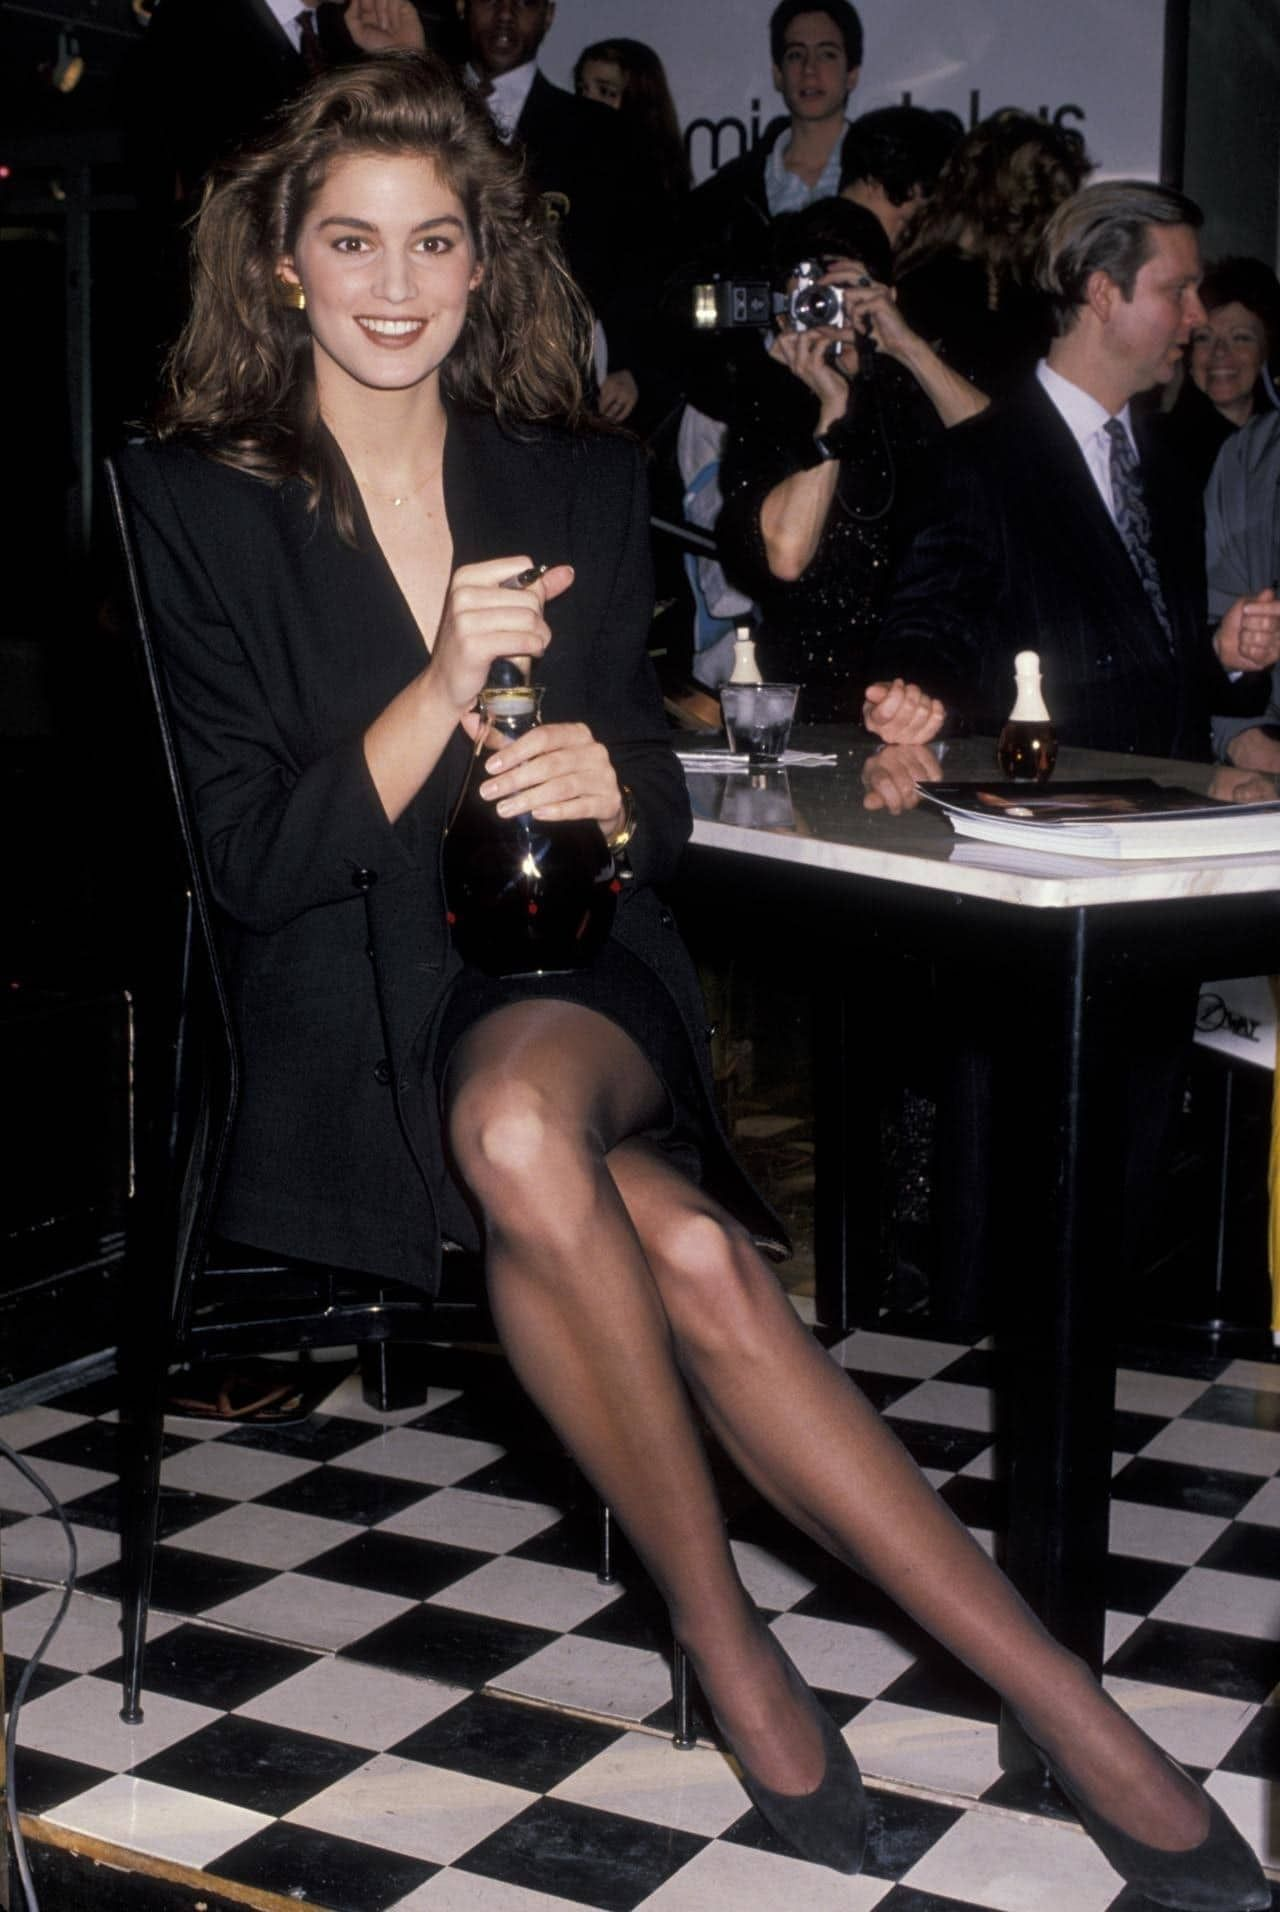 Cindy Crawfords legs - Sexy Celebrity Legs Images - Leggy